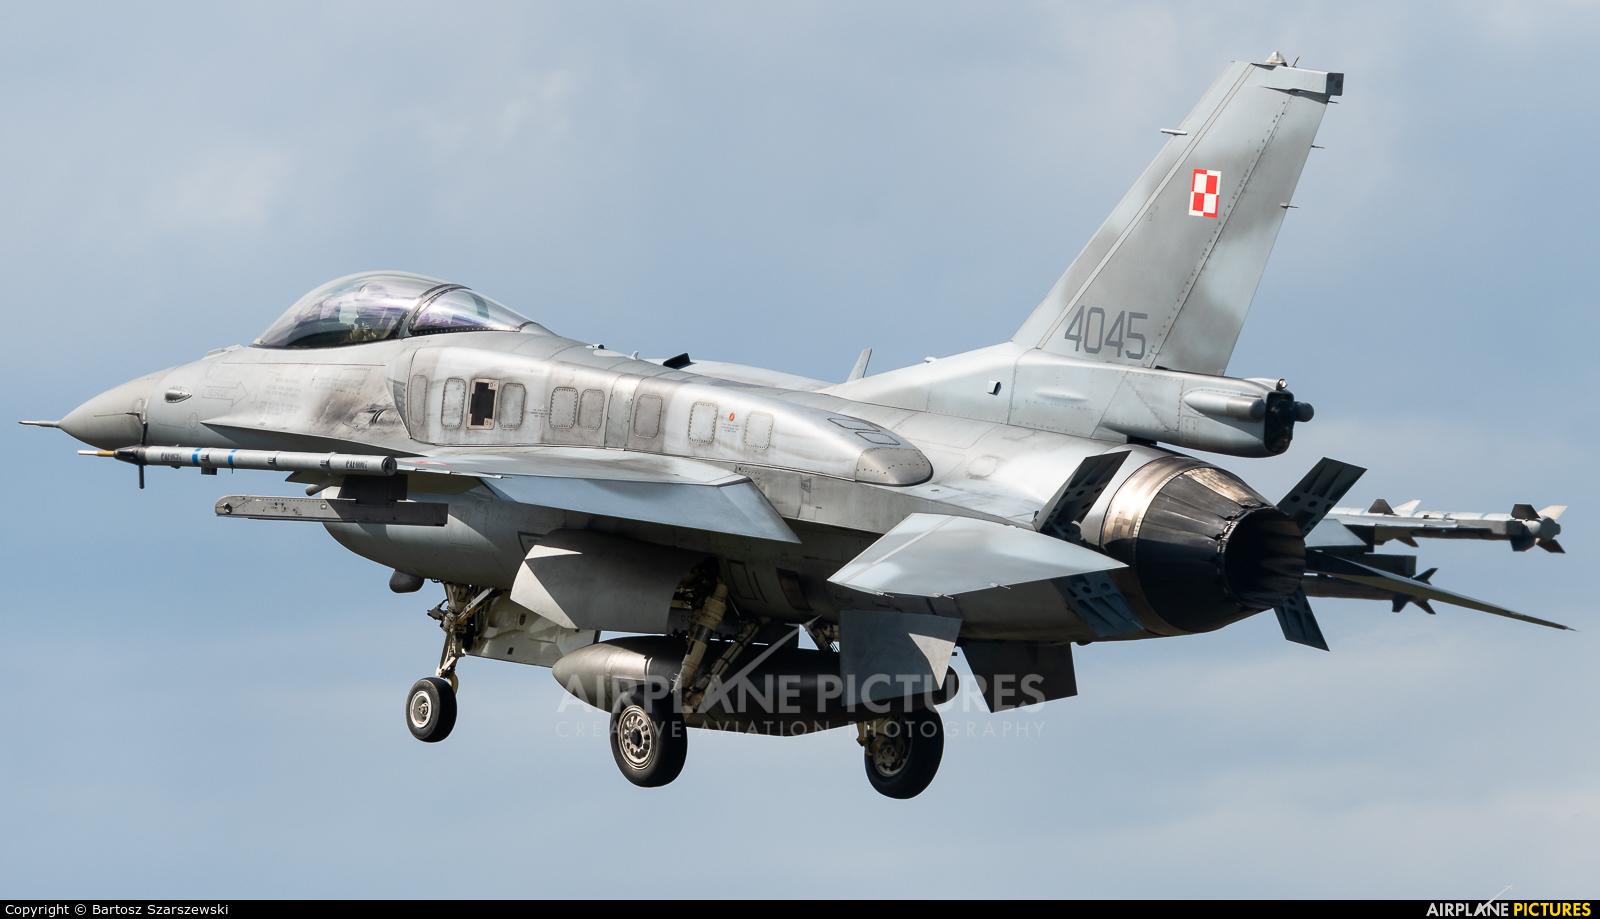 Poland - Air Force 4045 aircraft at Łask AB